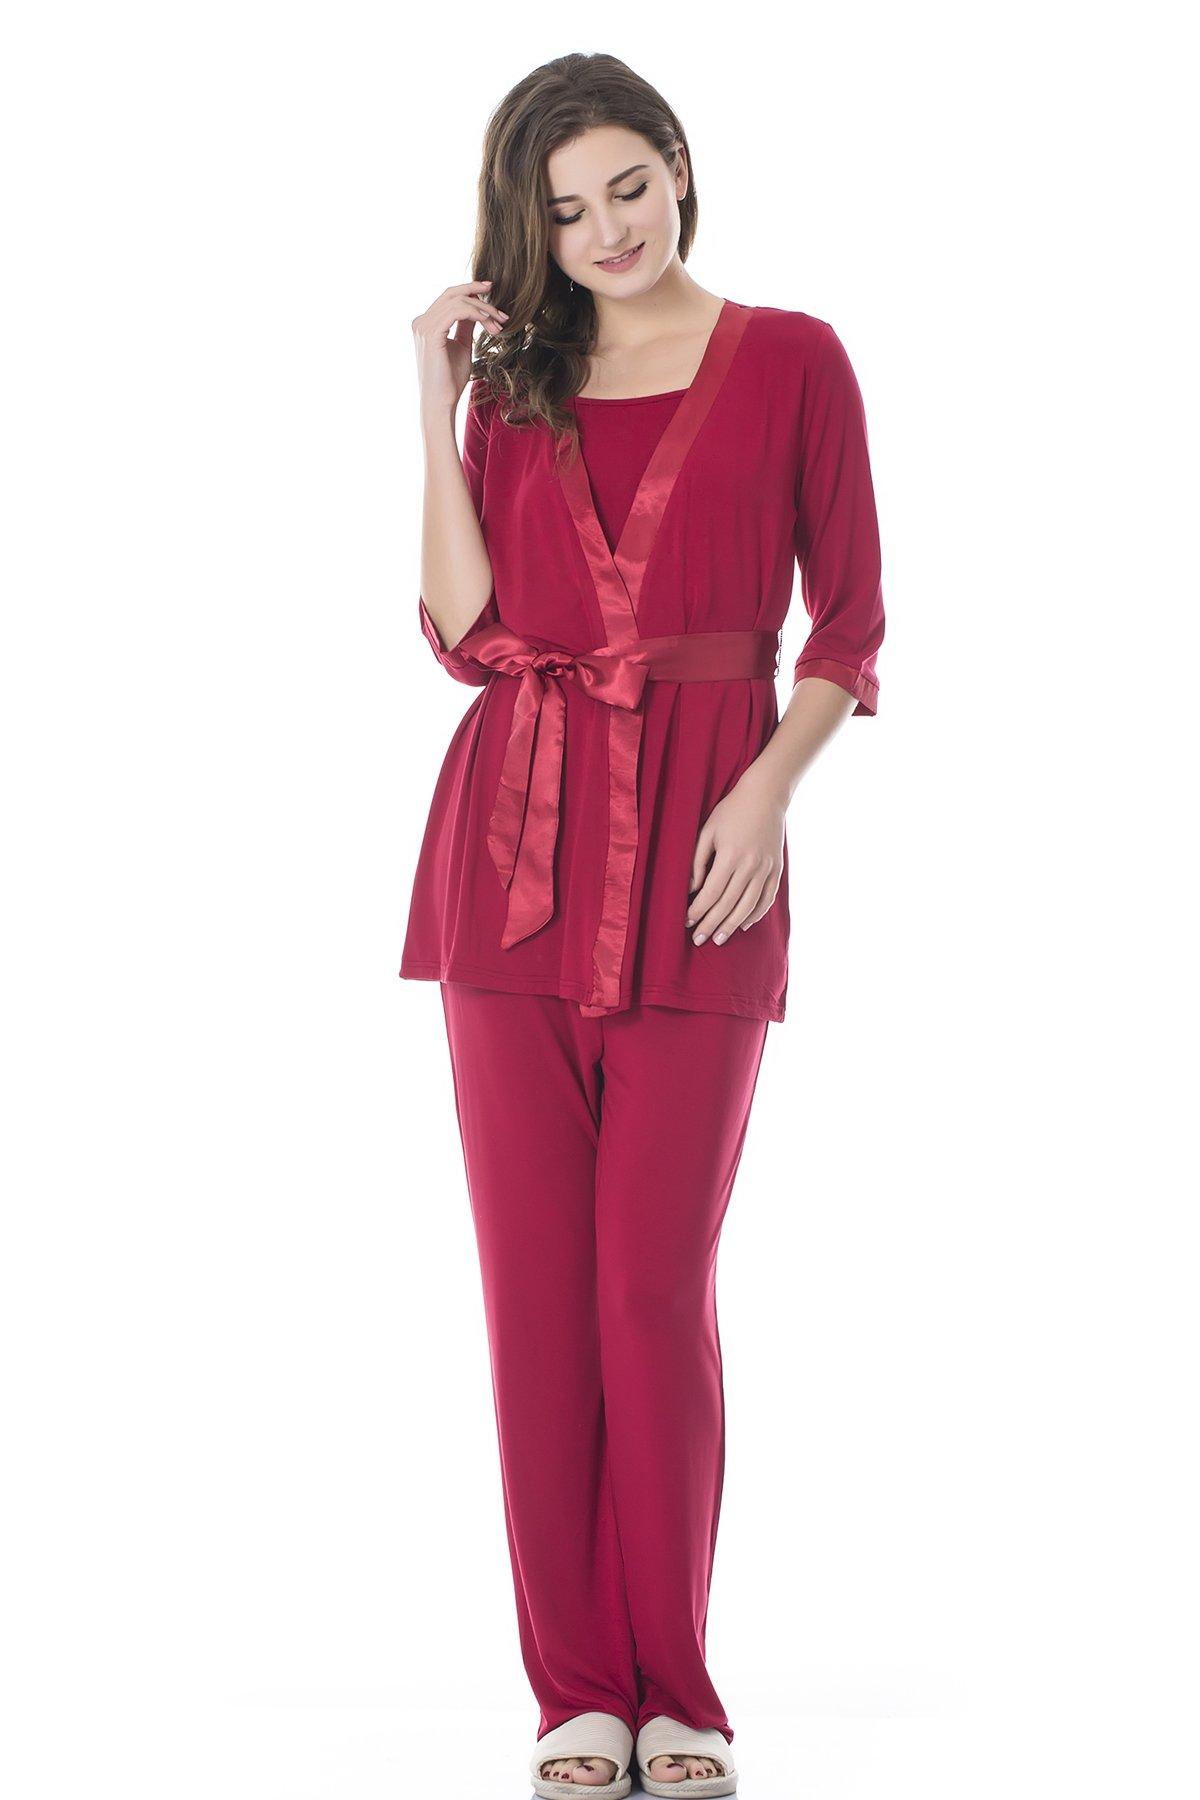 Bearsland Women's Maternity 3 Pieces Sleepwear Set Nursing Pajamas For Breastfeeding, Red, Large